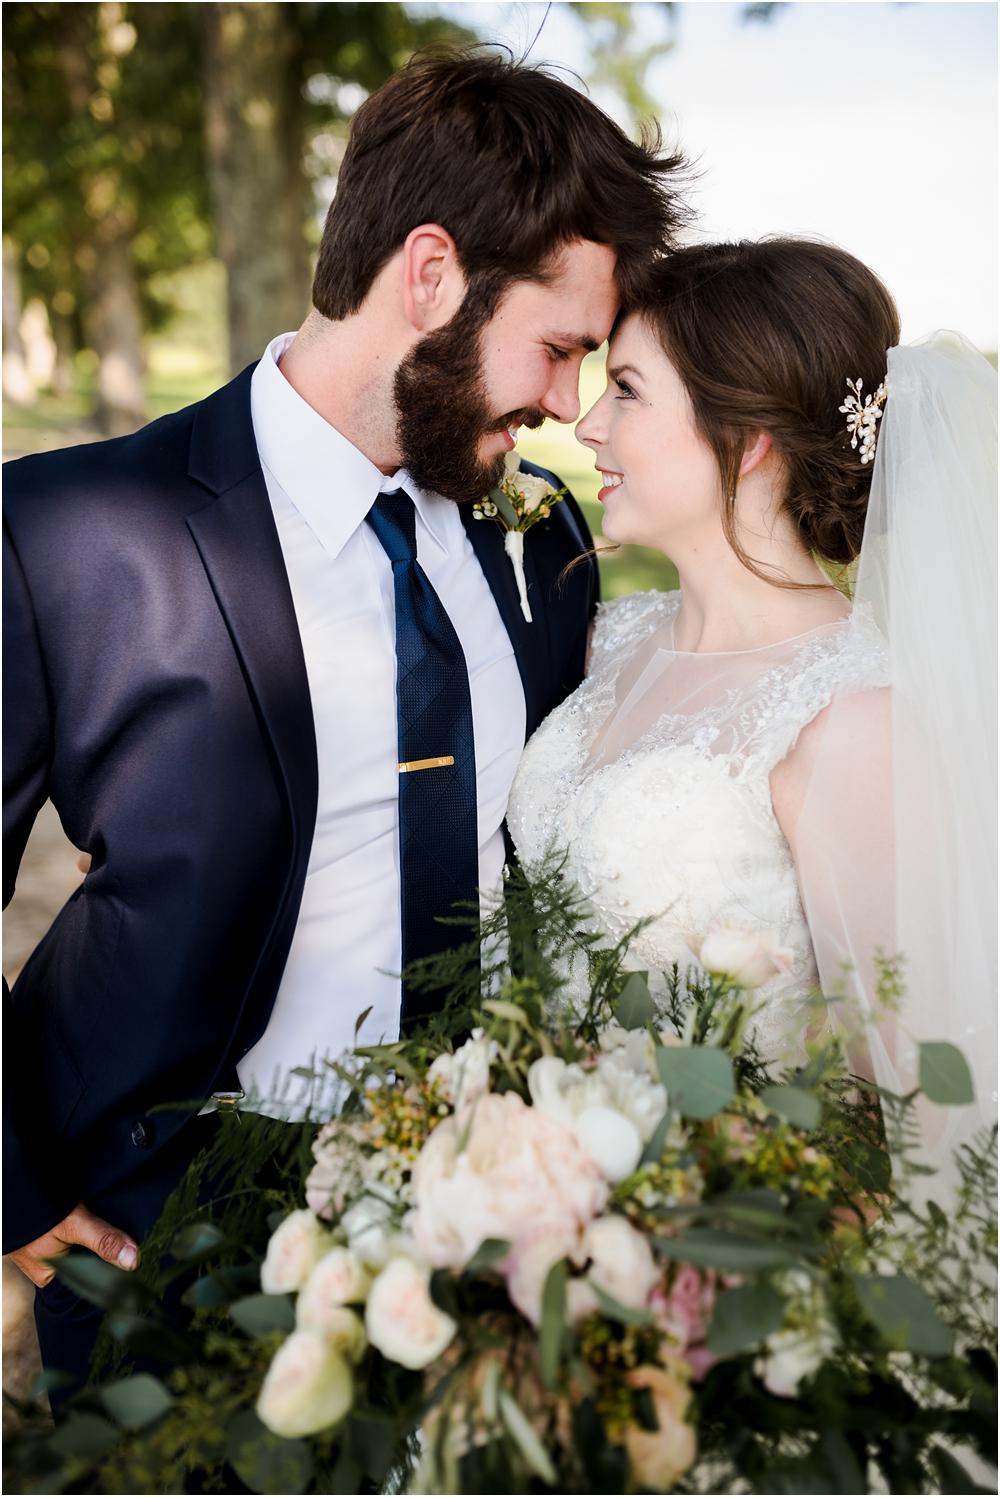 marianna-florida-wedding-photographer-kiersten-grant-60.jpg